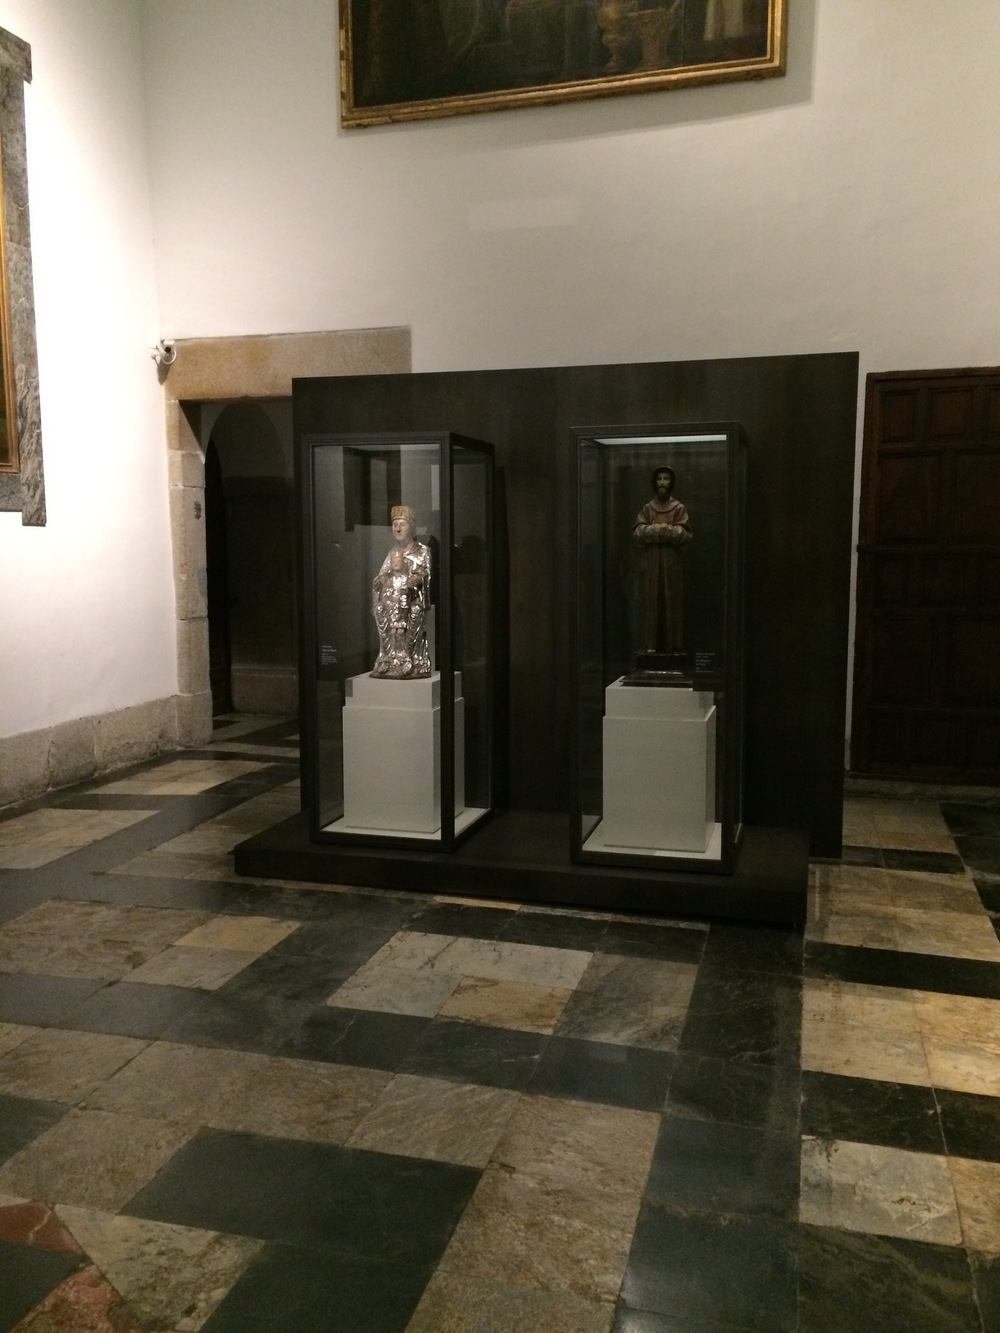 Ypunto_Sacristia_Mayor_Toledo_04.jpg